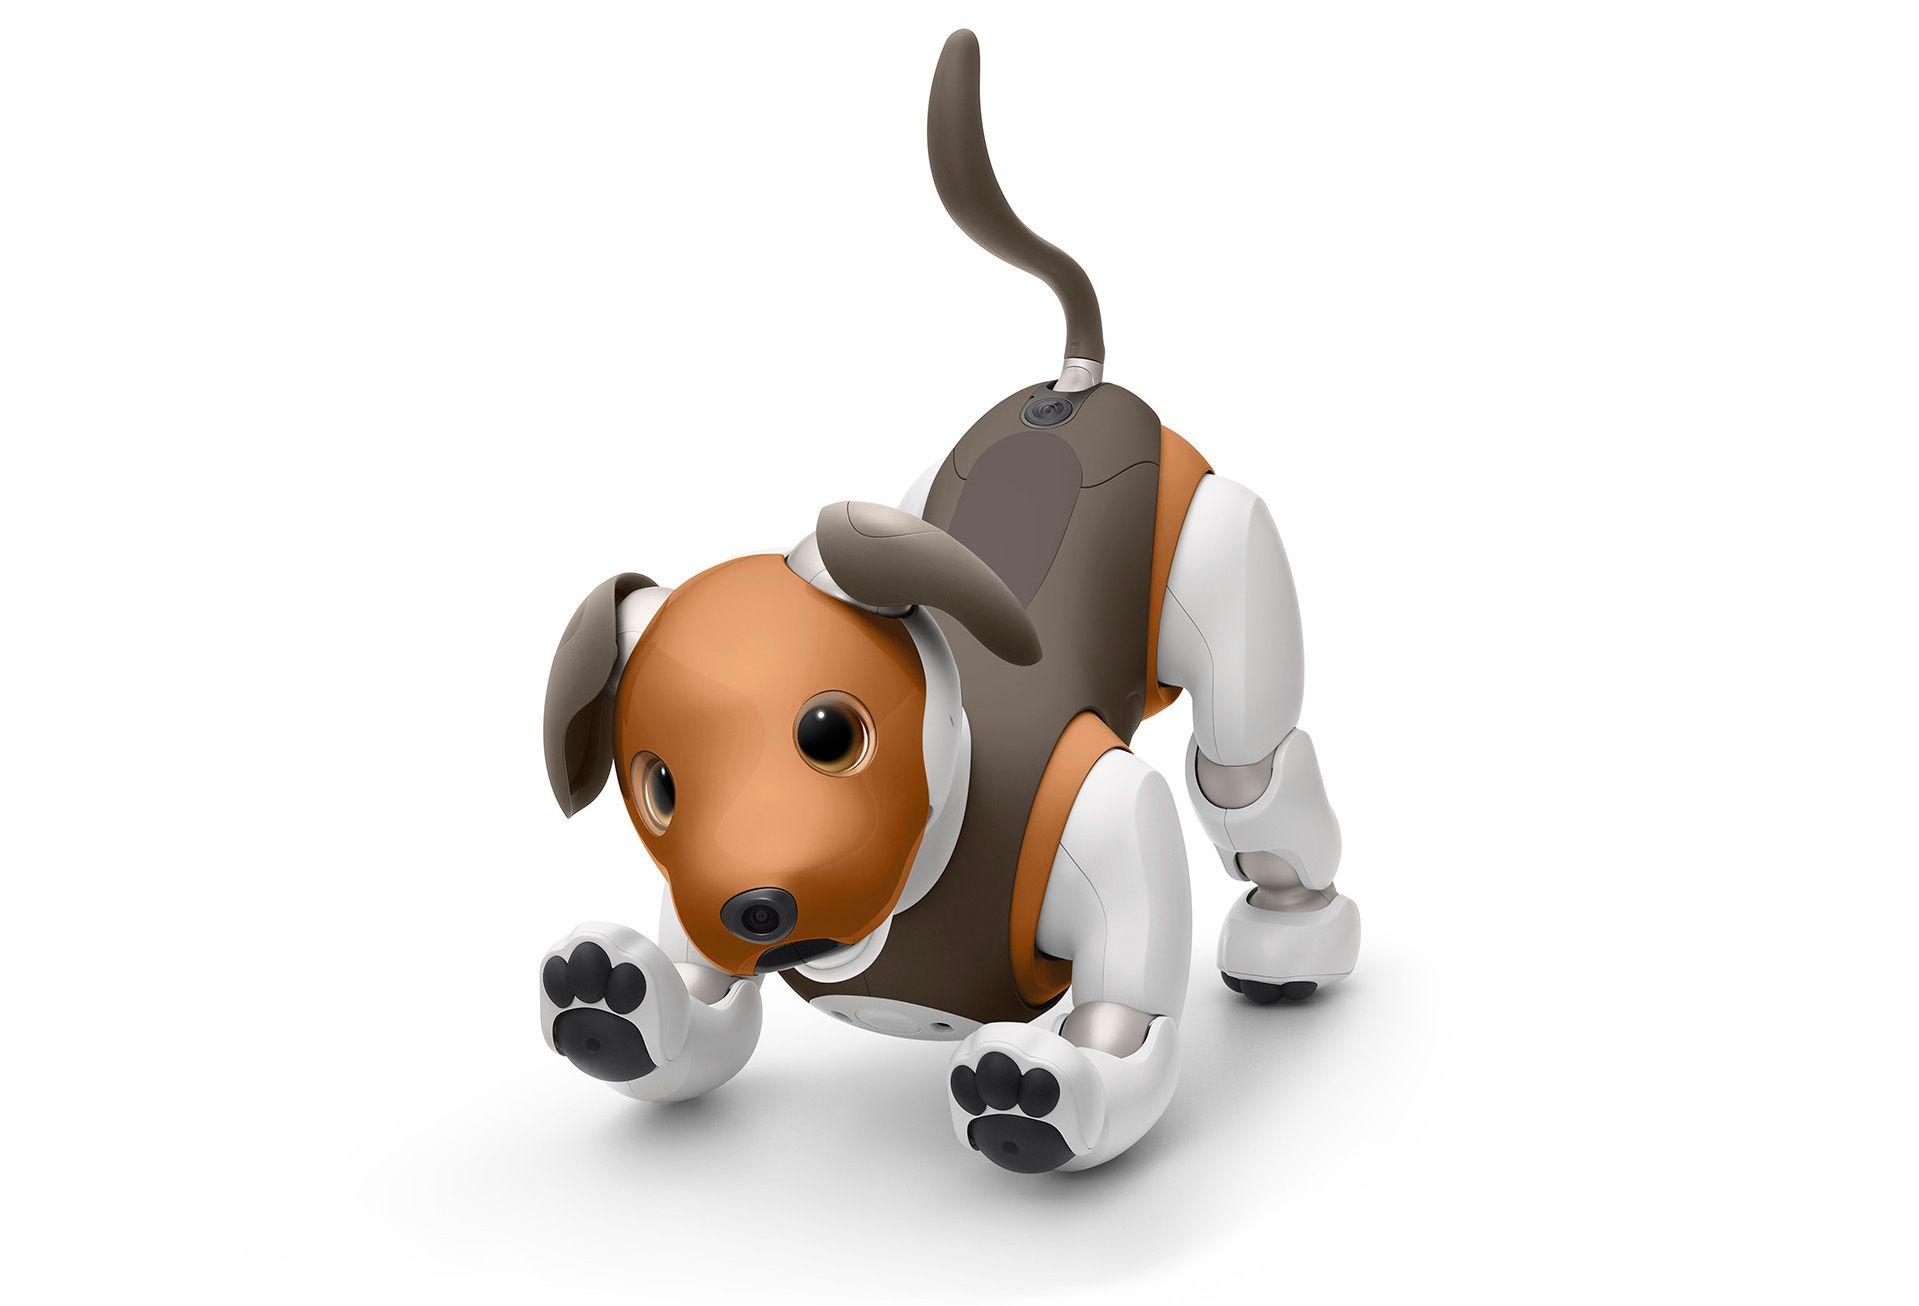 Sony's Aibo robot dog, chocolate edition